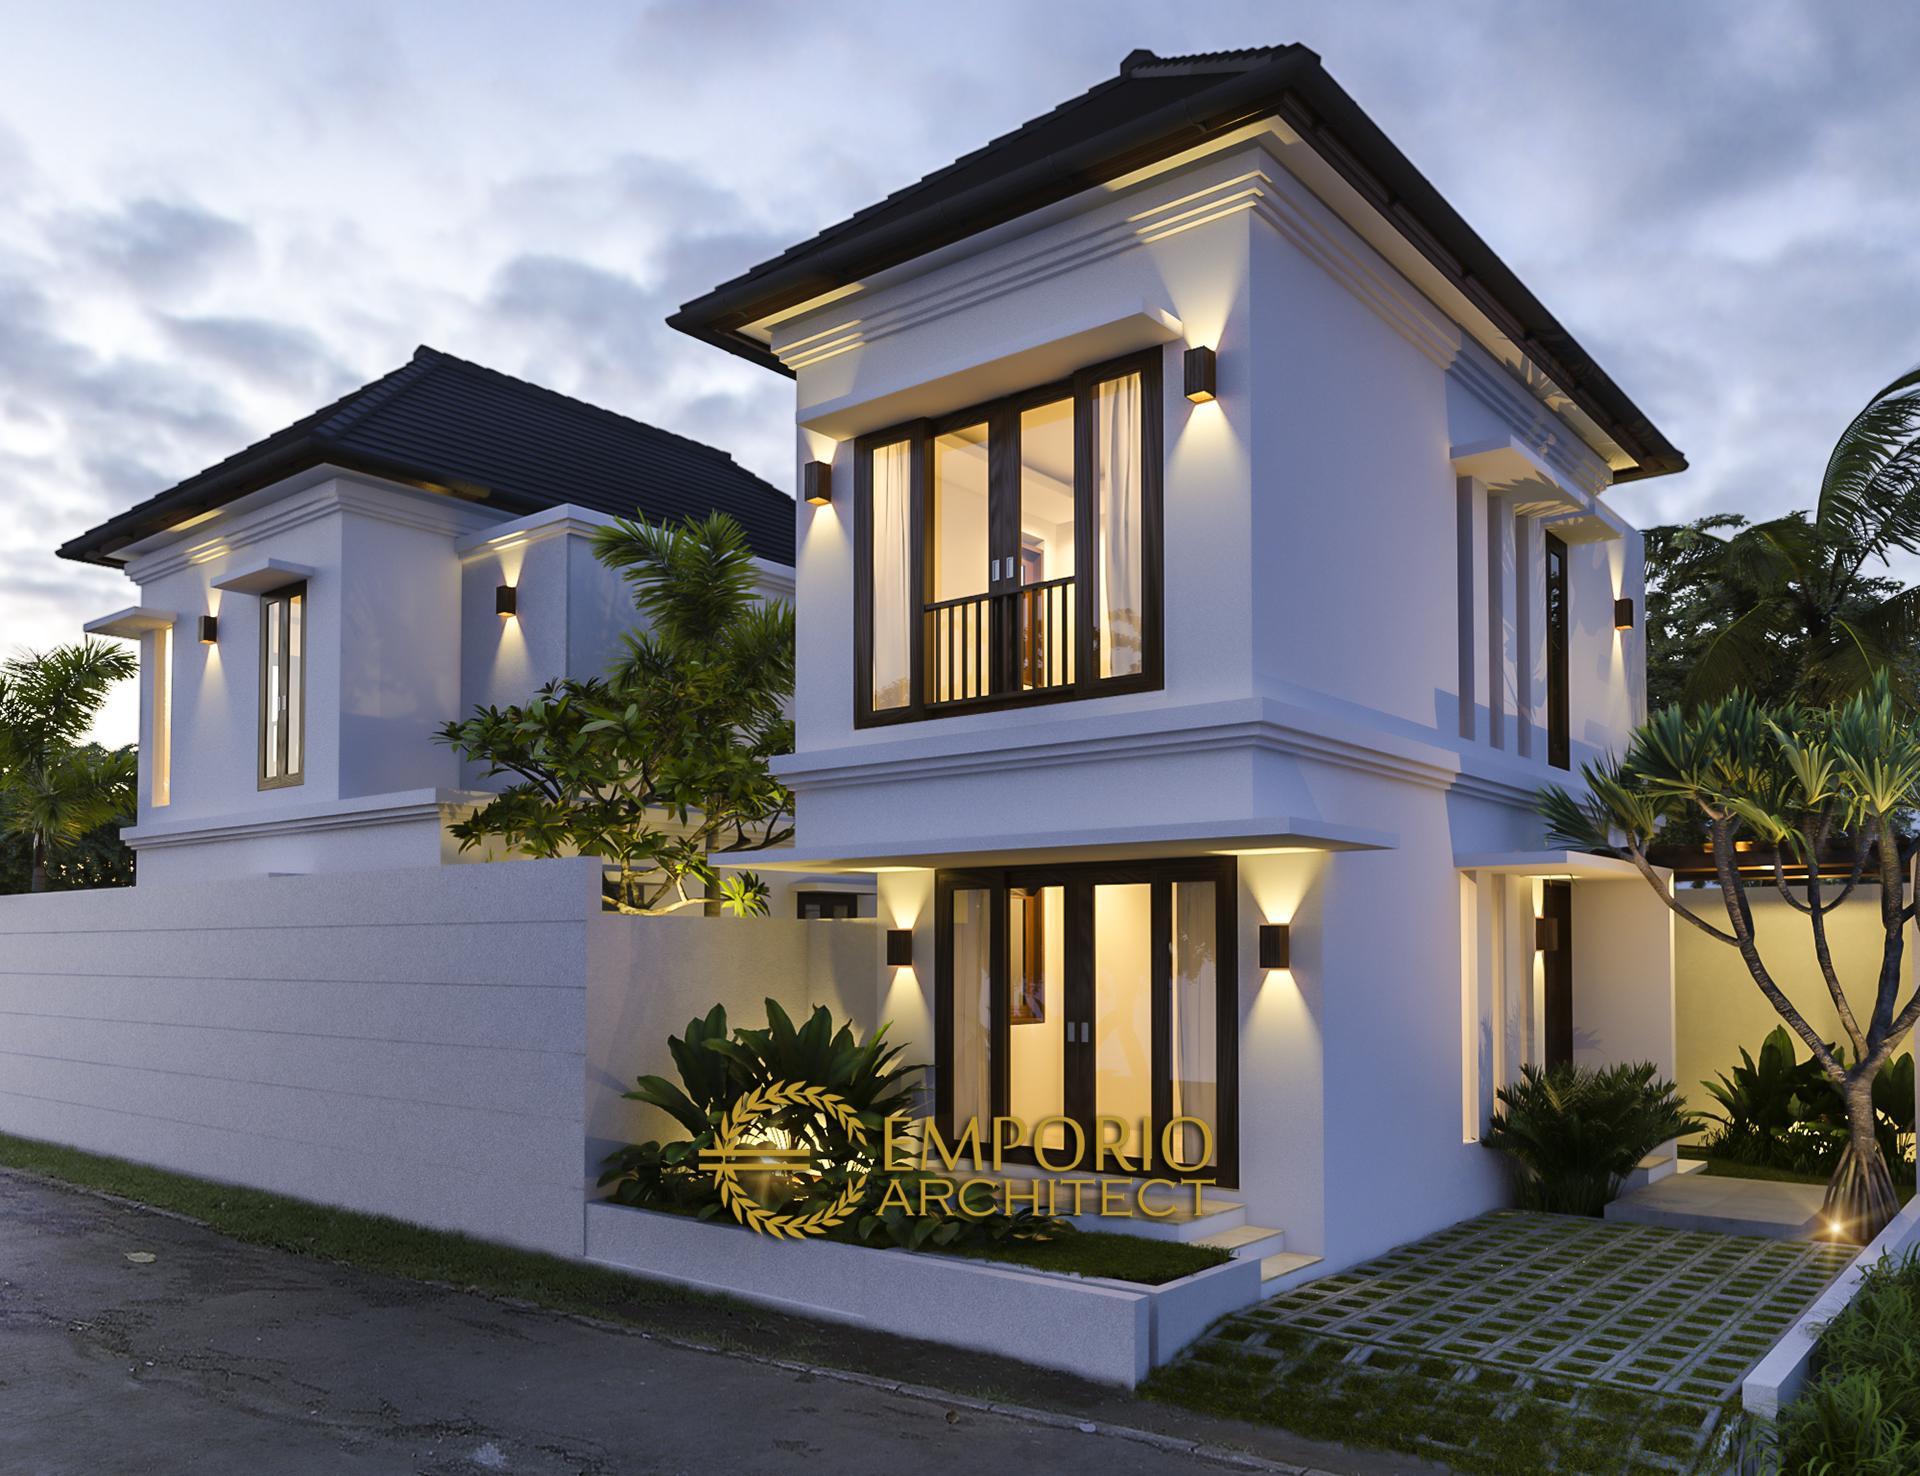 Mrs. Wiwit Villa Bali House 2 Floors Design - Jimbaran